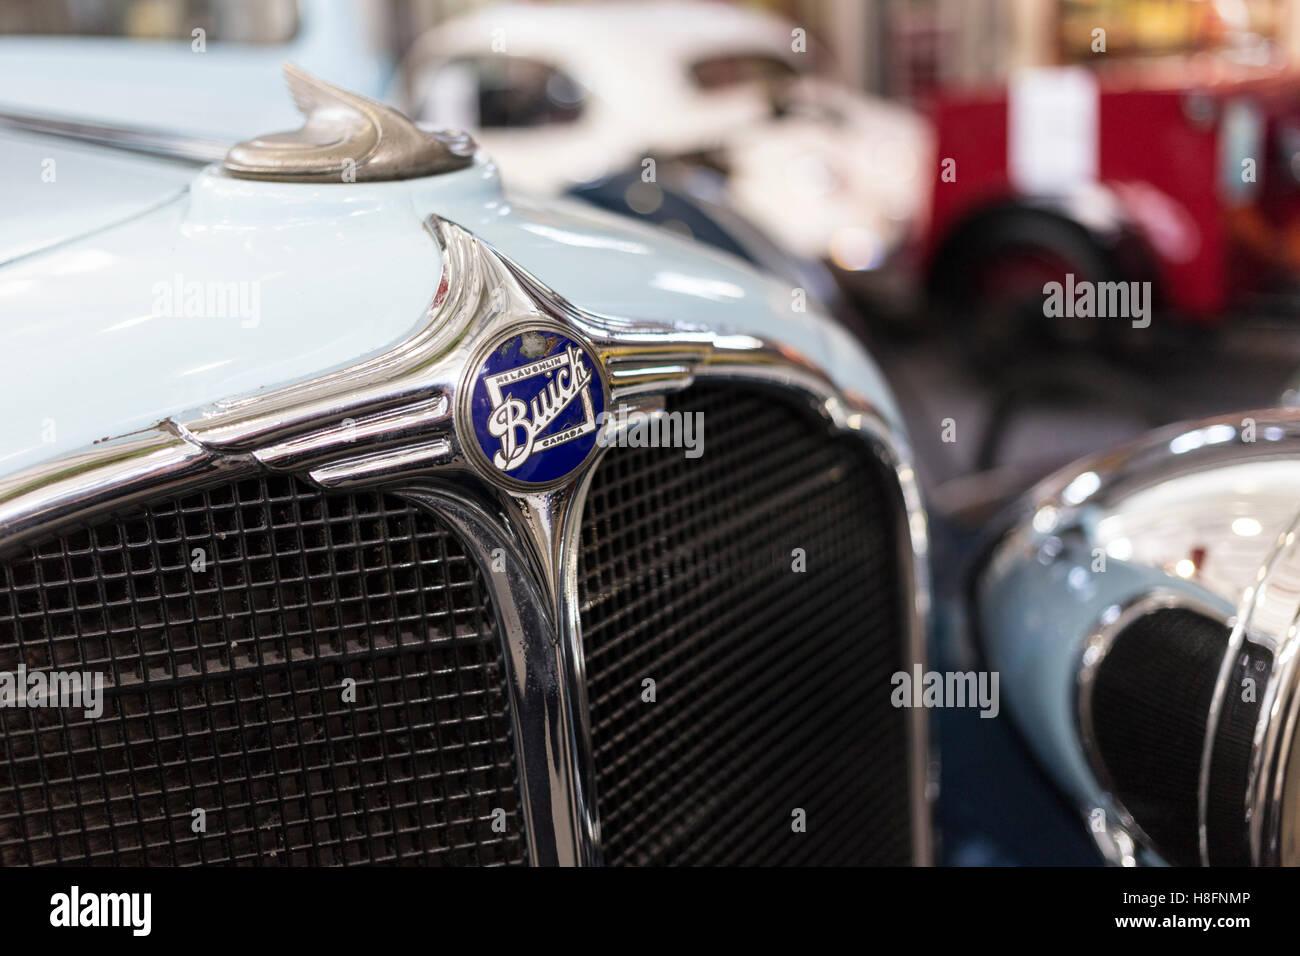 Ein Buick im Lakeland Motor Museum in Backbarrow, Cumbria, Lake District Stockbild